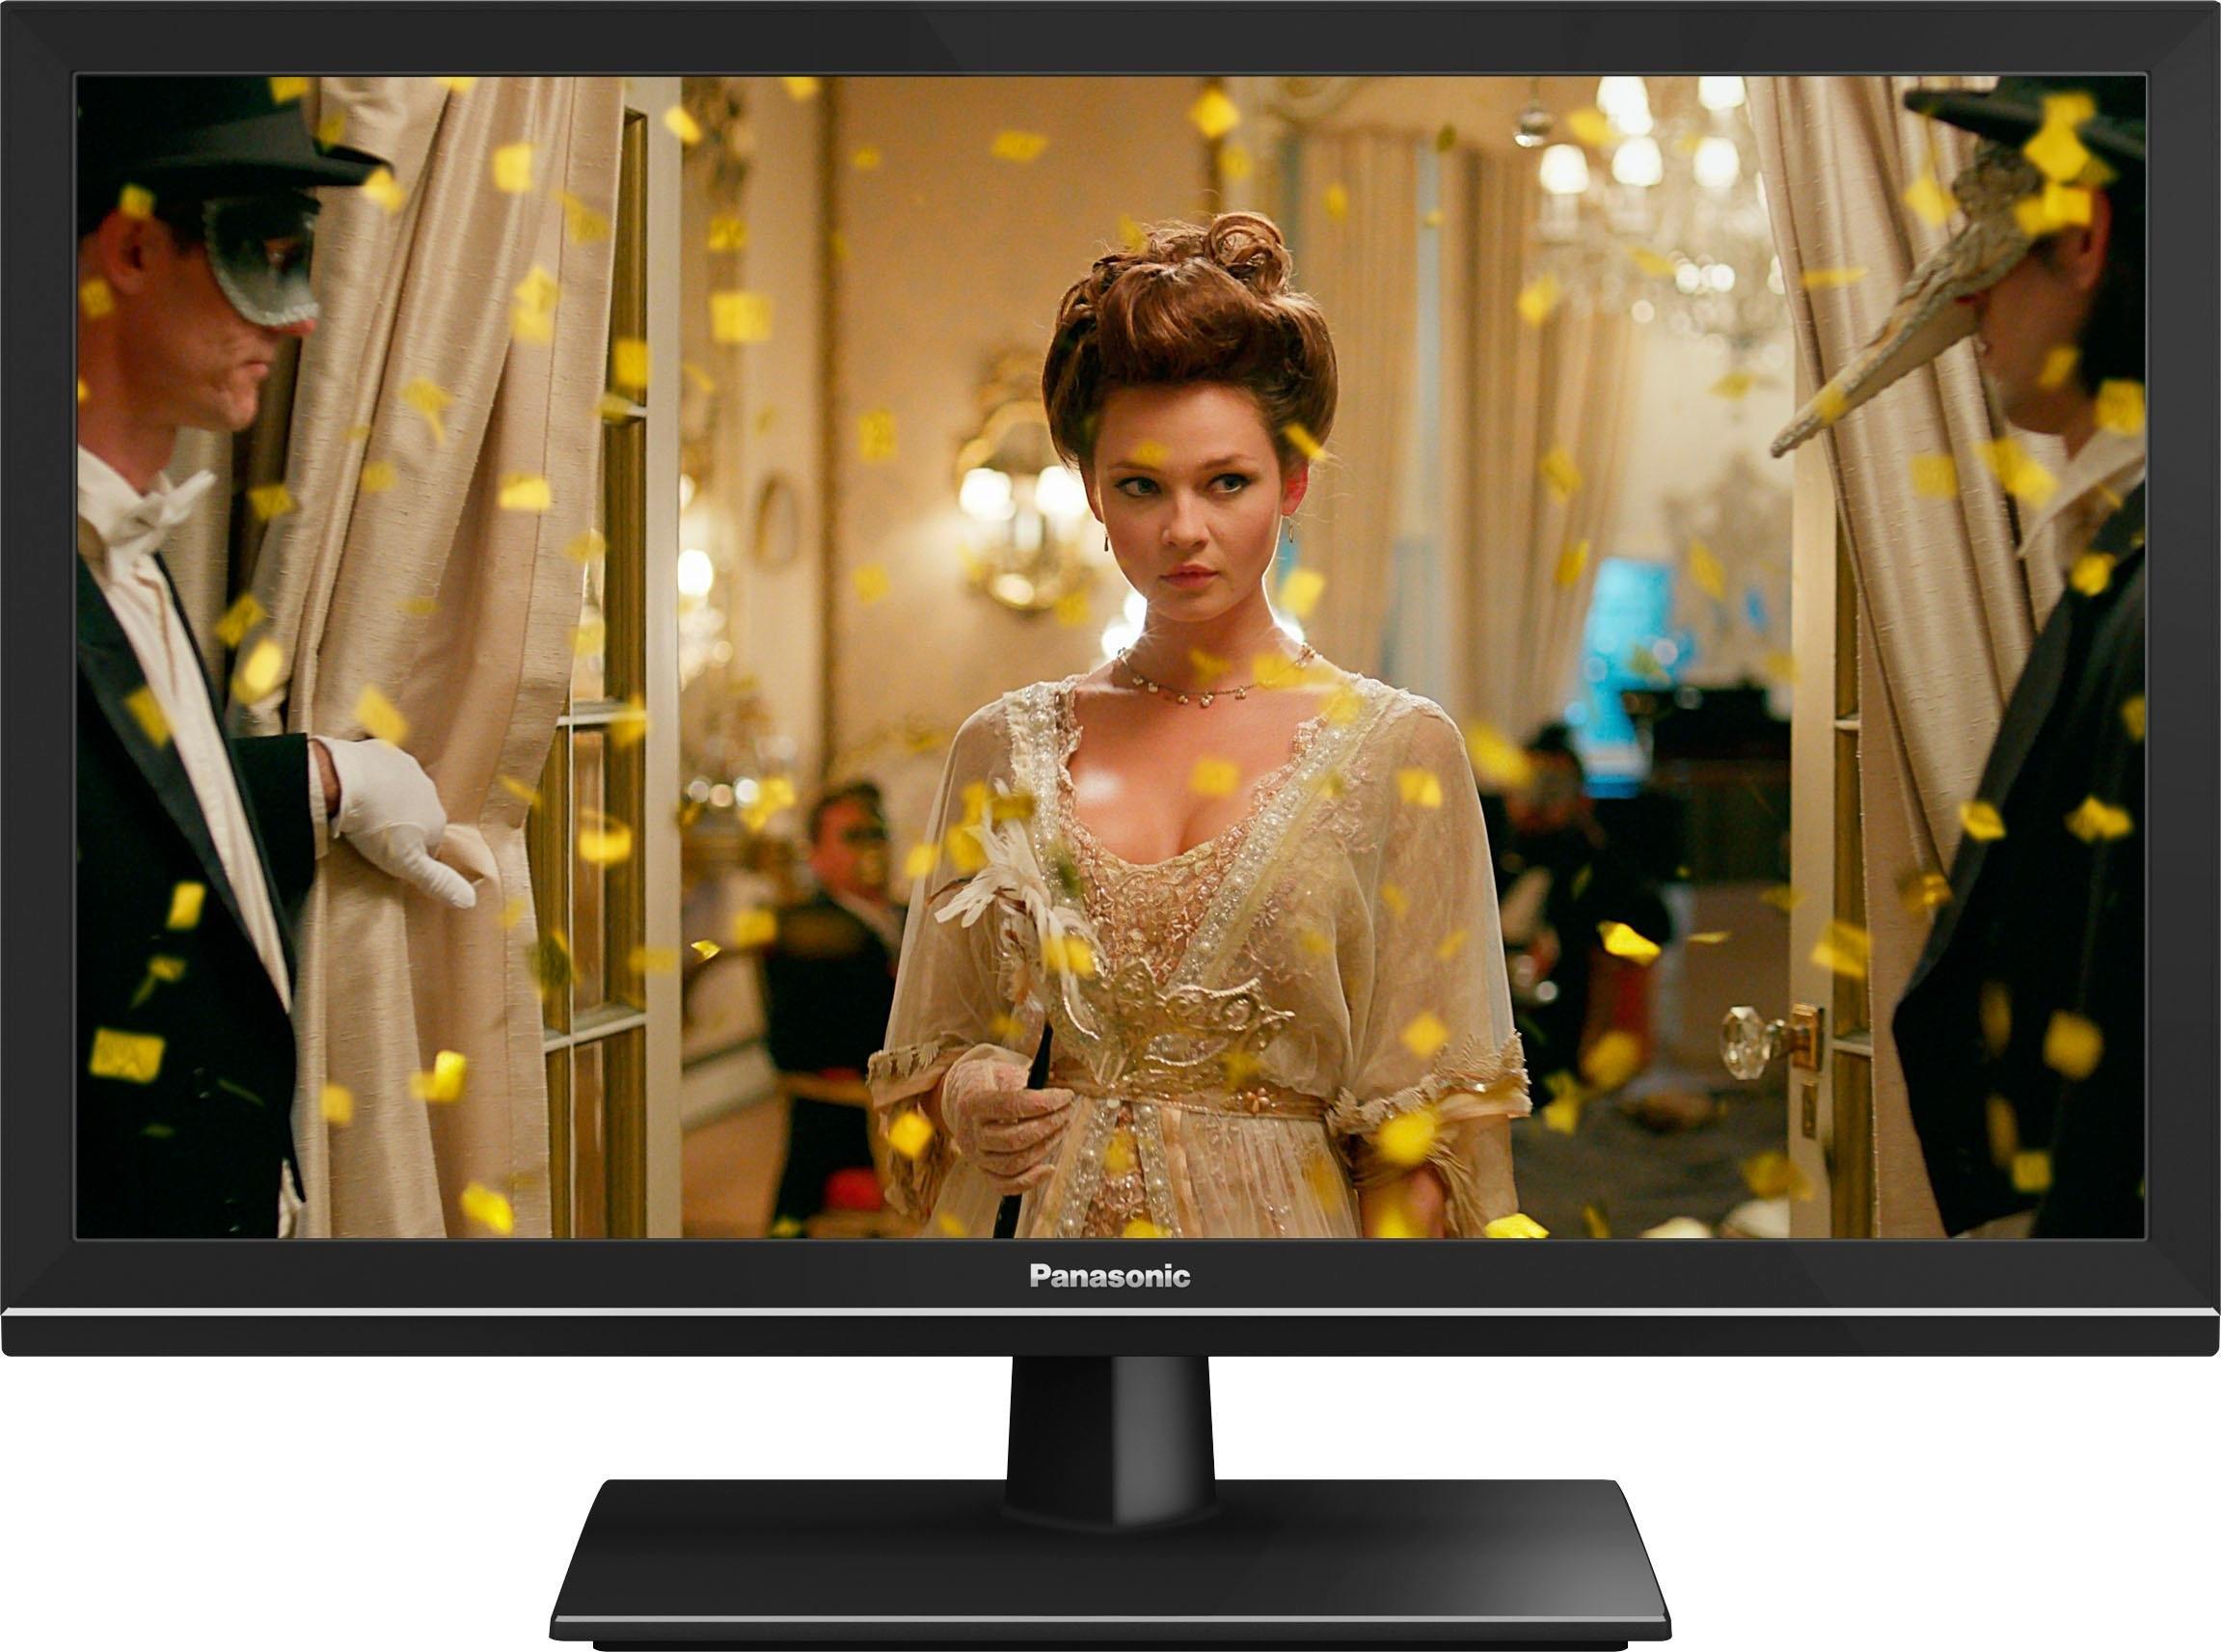 Panasonic TX-24FSW504 led-tv (24 inch), HD-ready, smart-tv voordelig en veilig online kopen